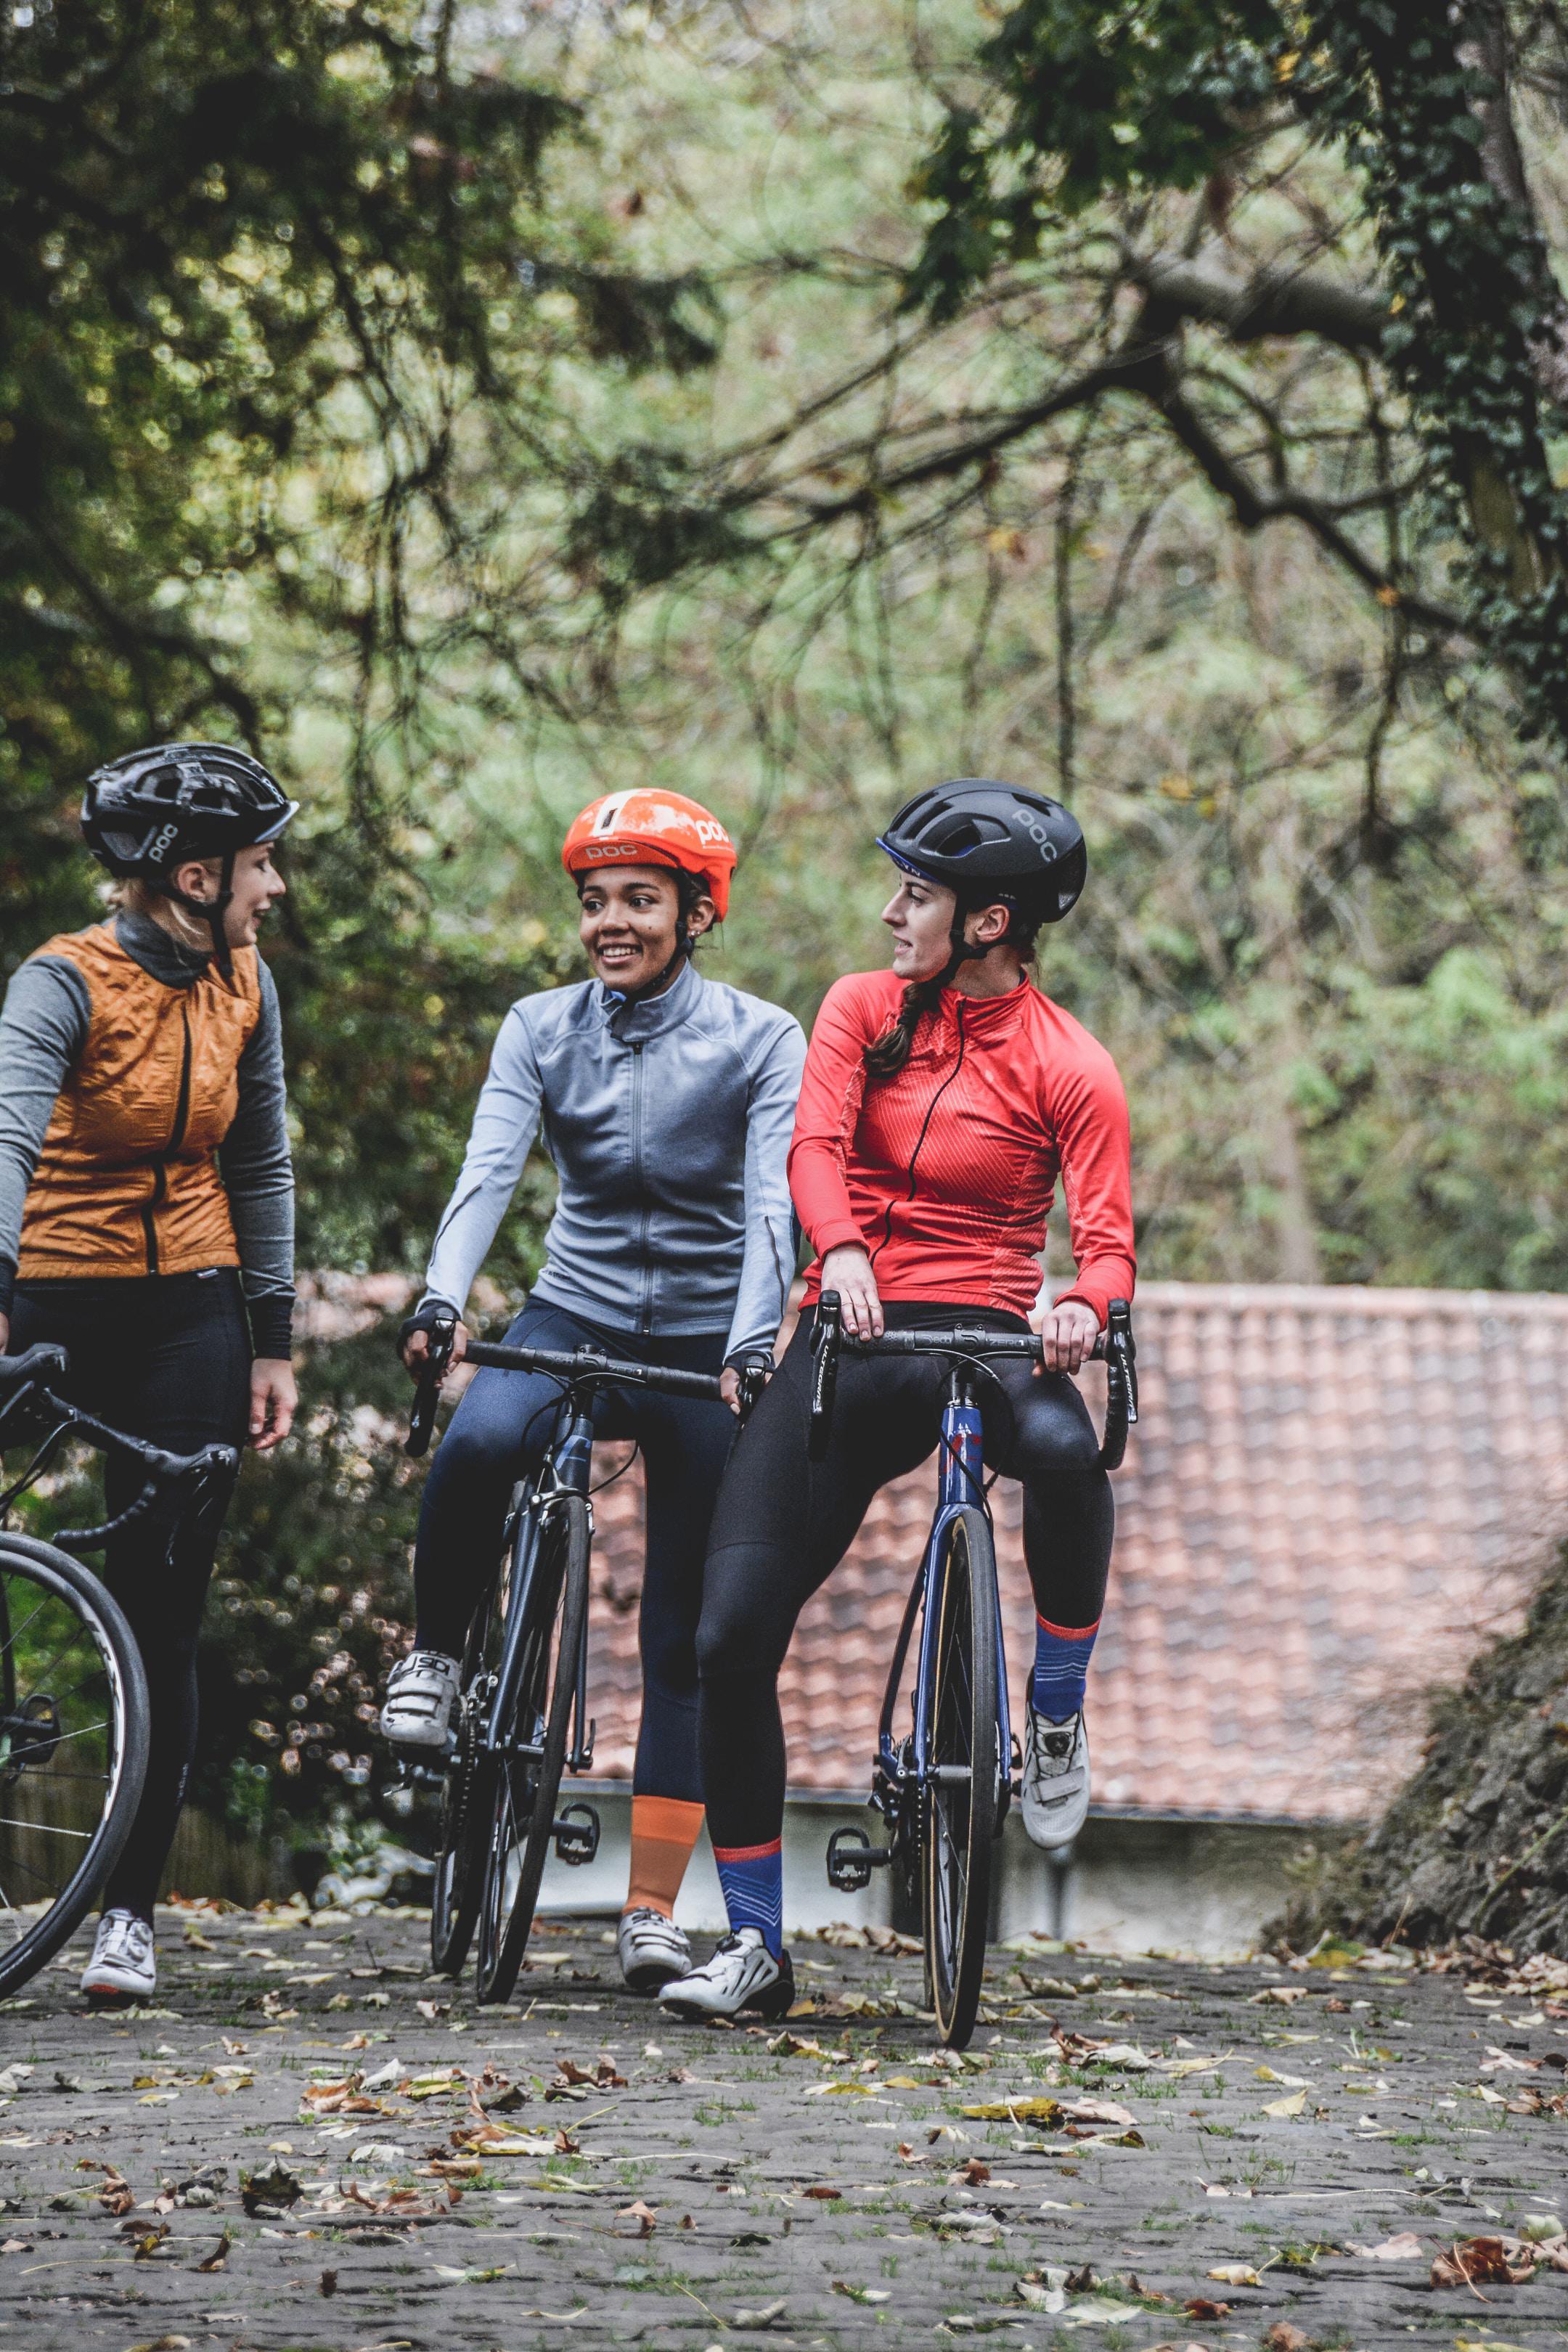 Girls on Fons bikes